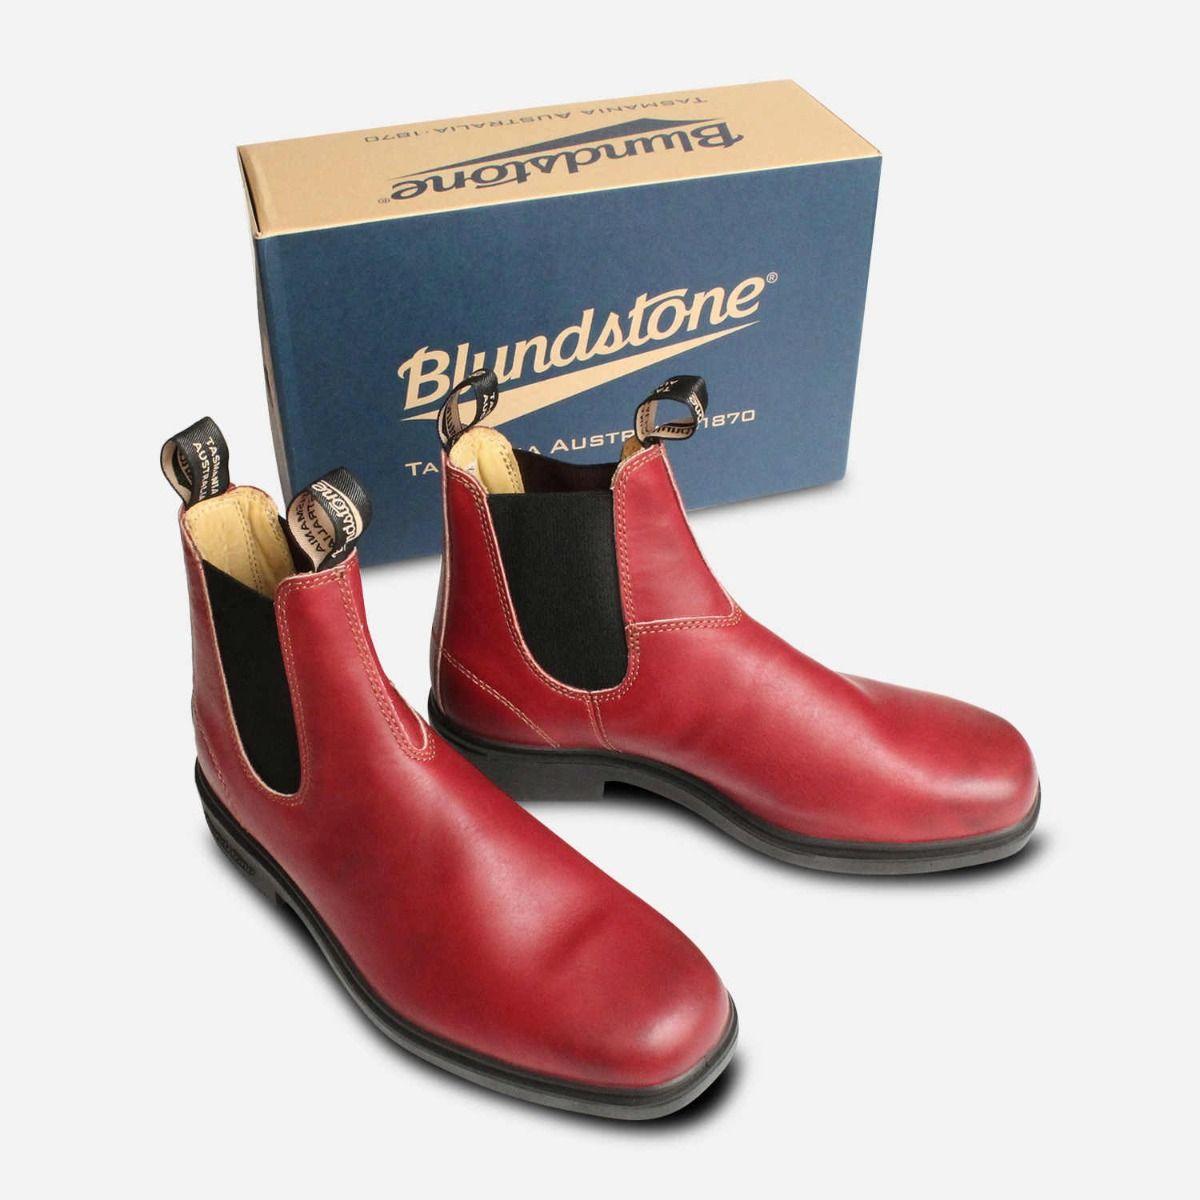 Mua khi du lịch Melbourne - Những đôi boots Blundstone